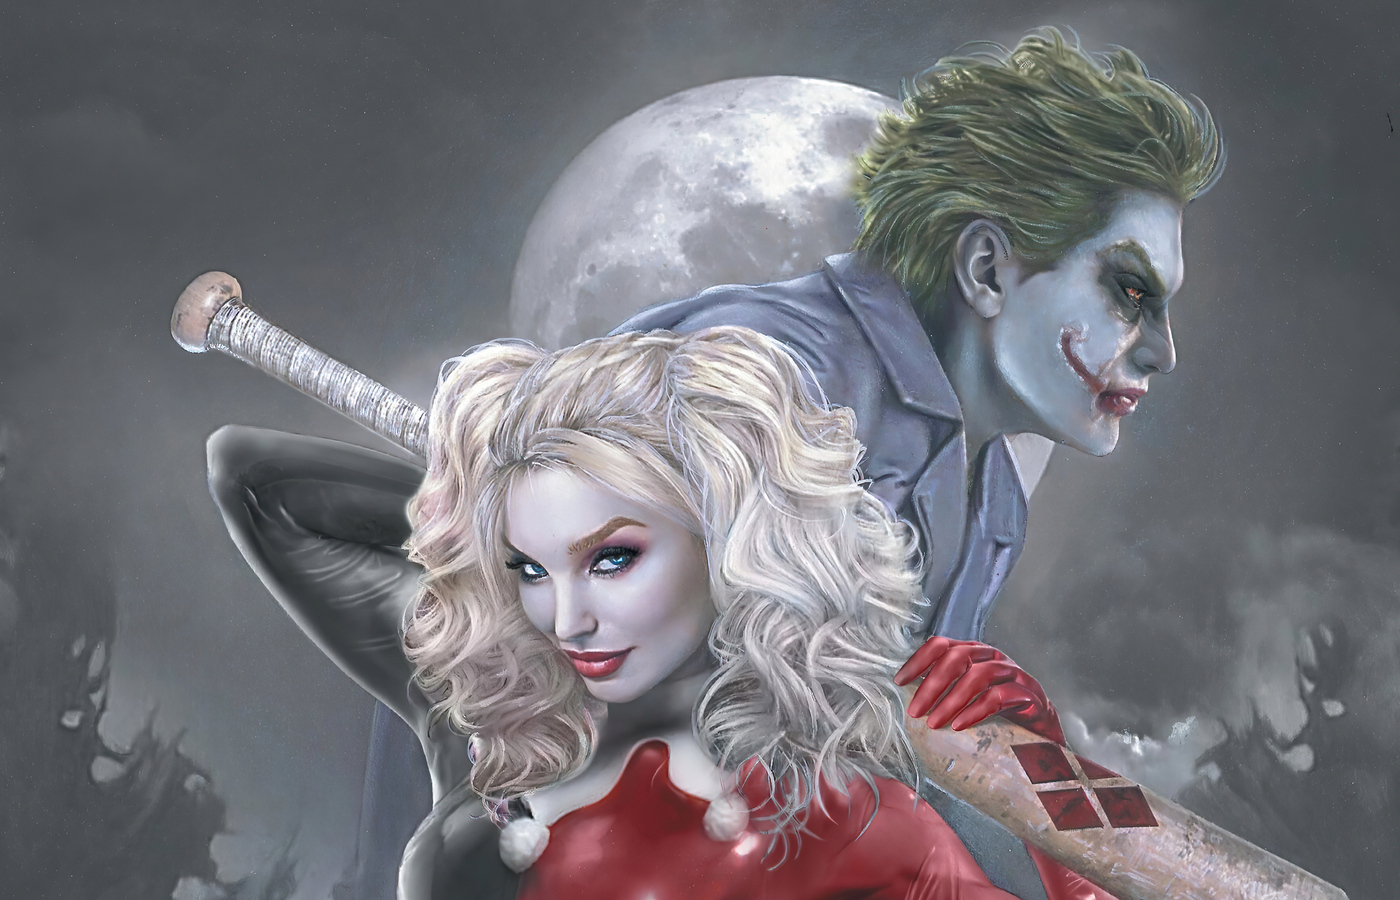 1400x900 Joker And Harley Quinn 4k New 1400x900 Resolution ...